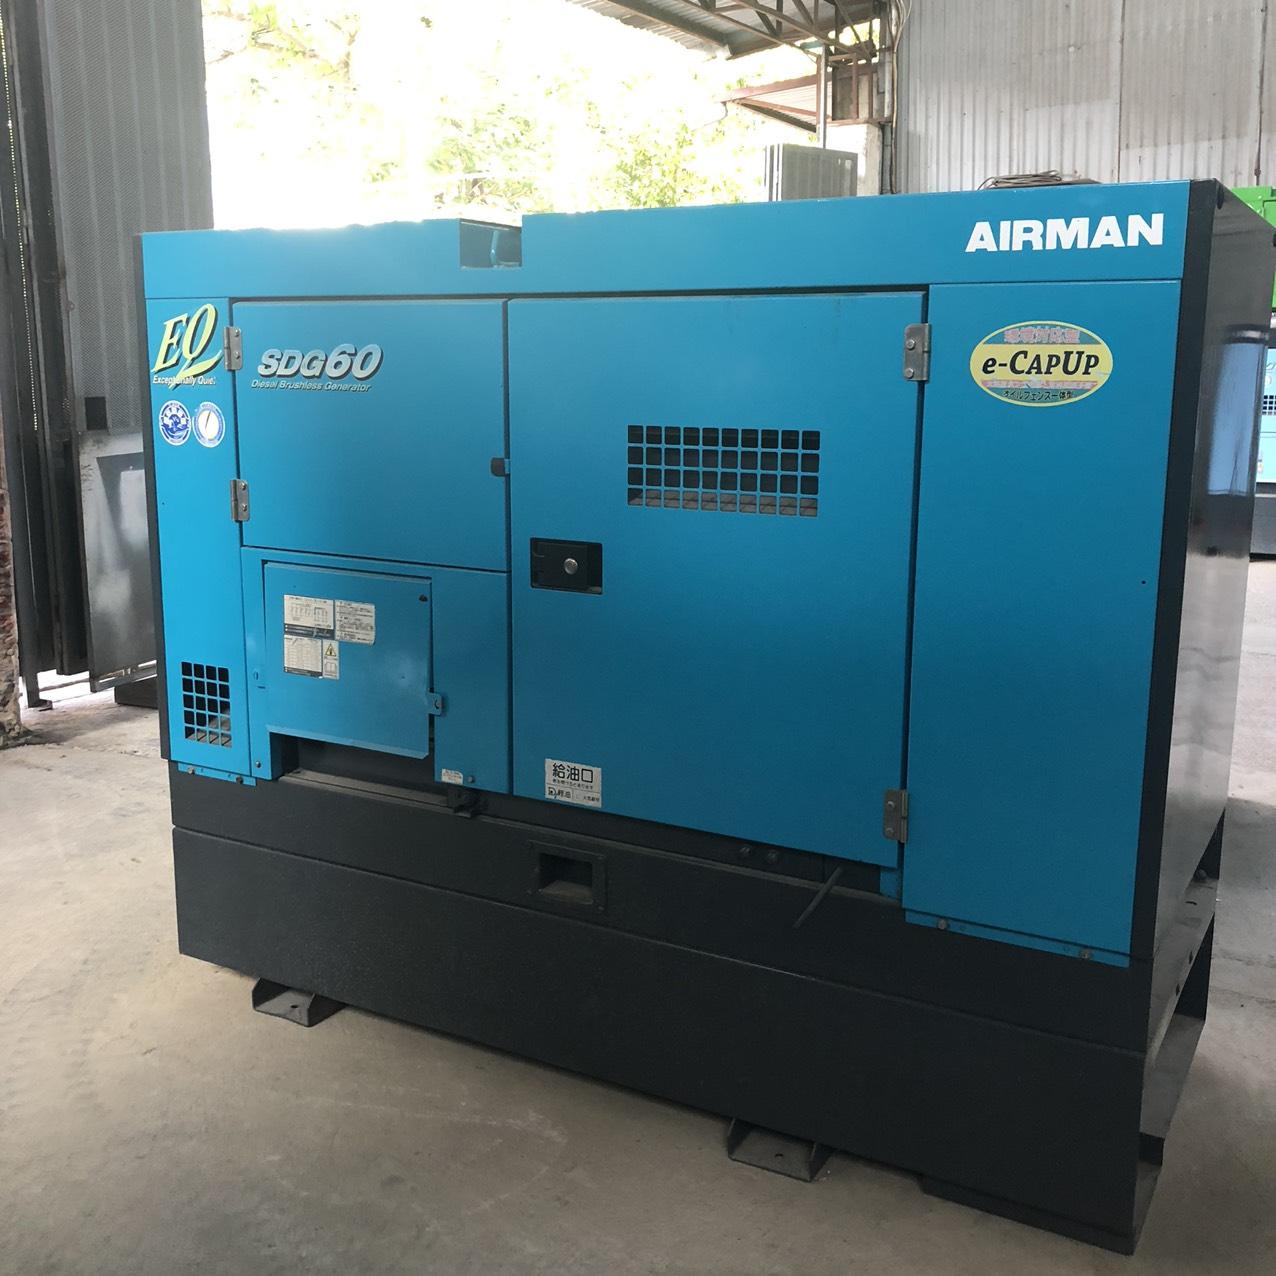 Máy phát điện 60 kva AIRMAN